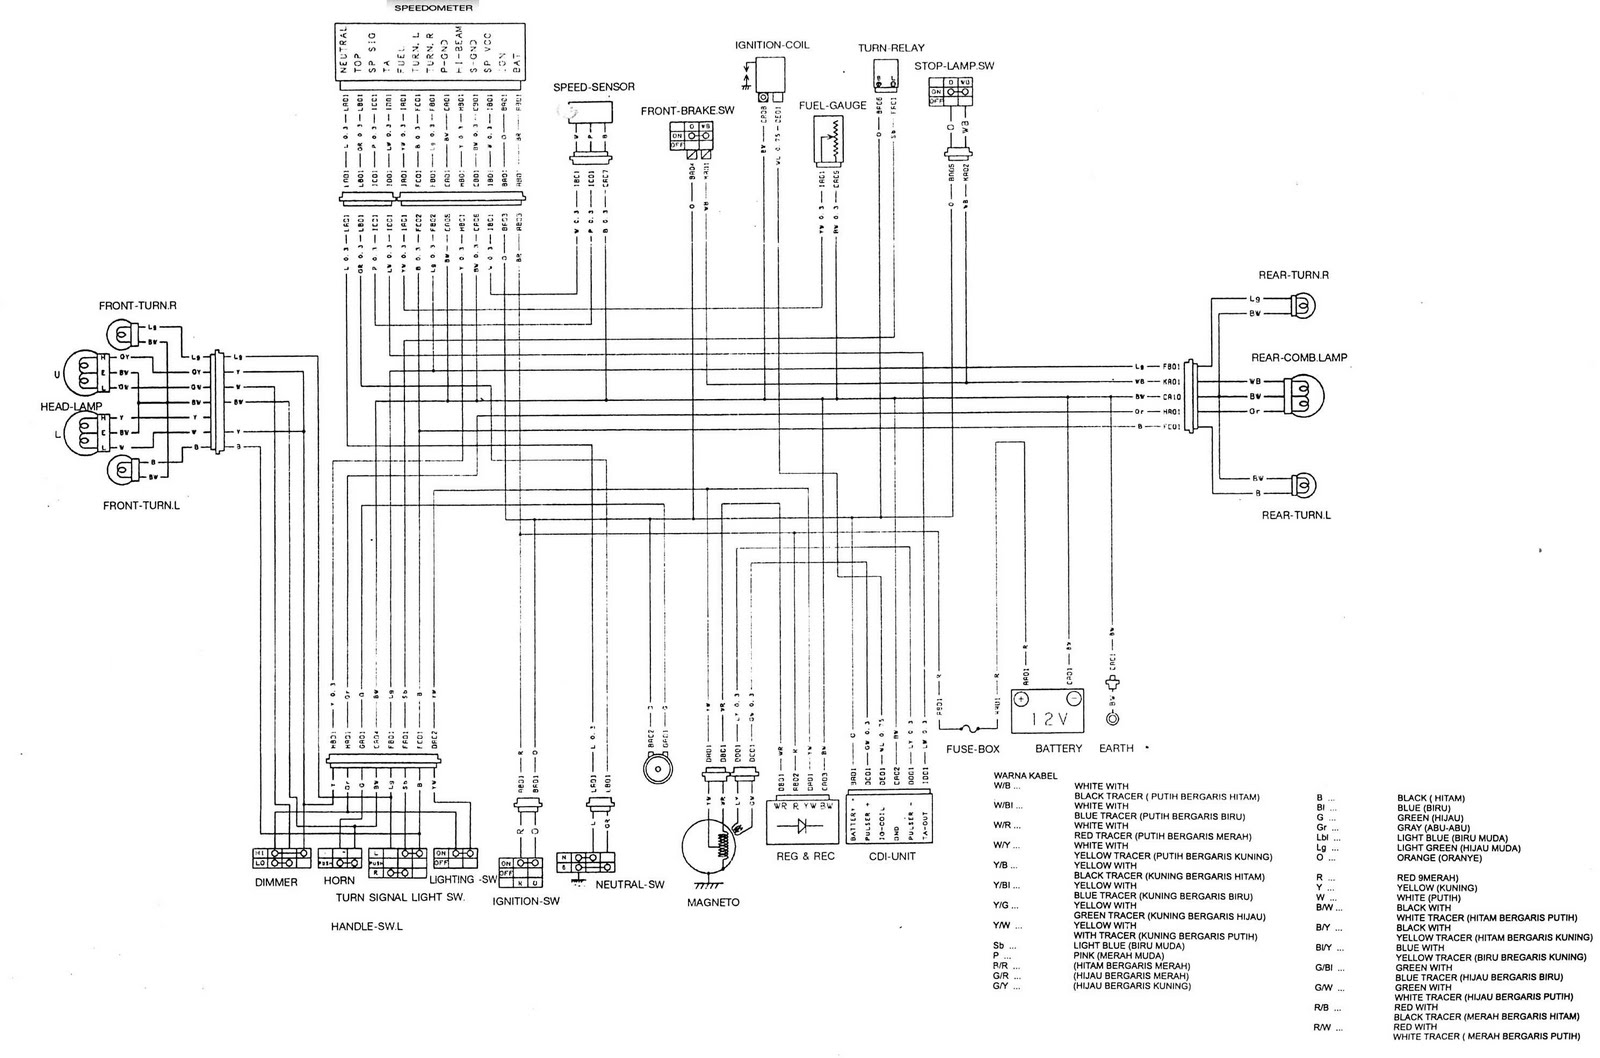 small resolution of wrg 8908 motofino wiring diagramverucci wiring diagram verucci free engine image for verucci luggage verucci